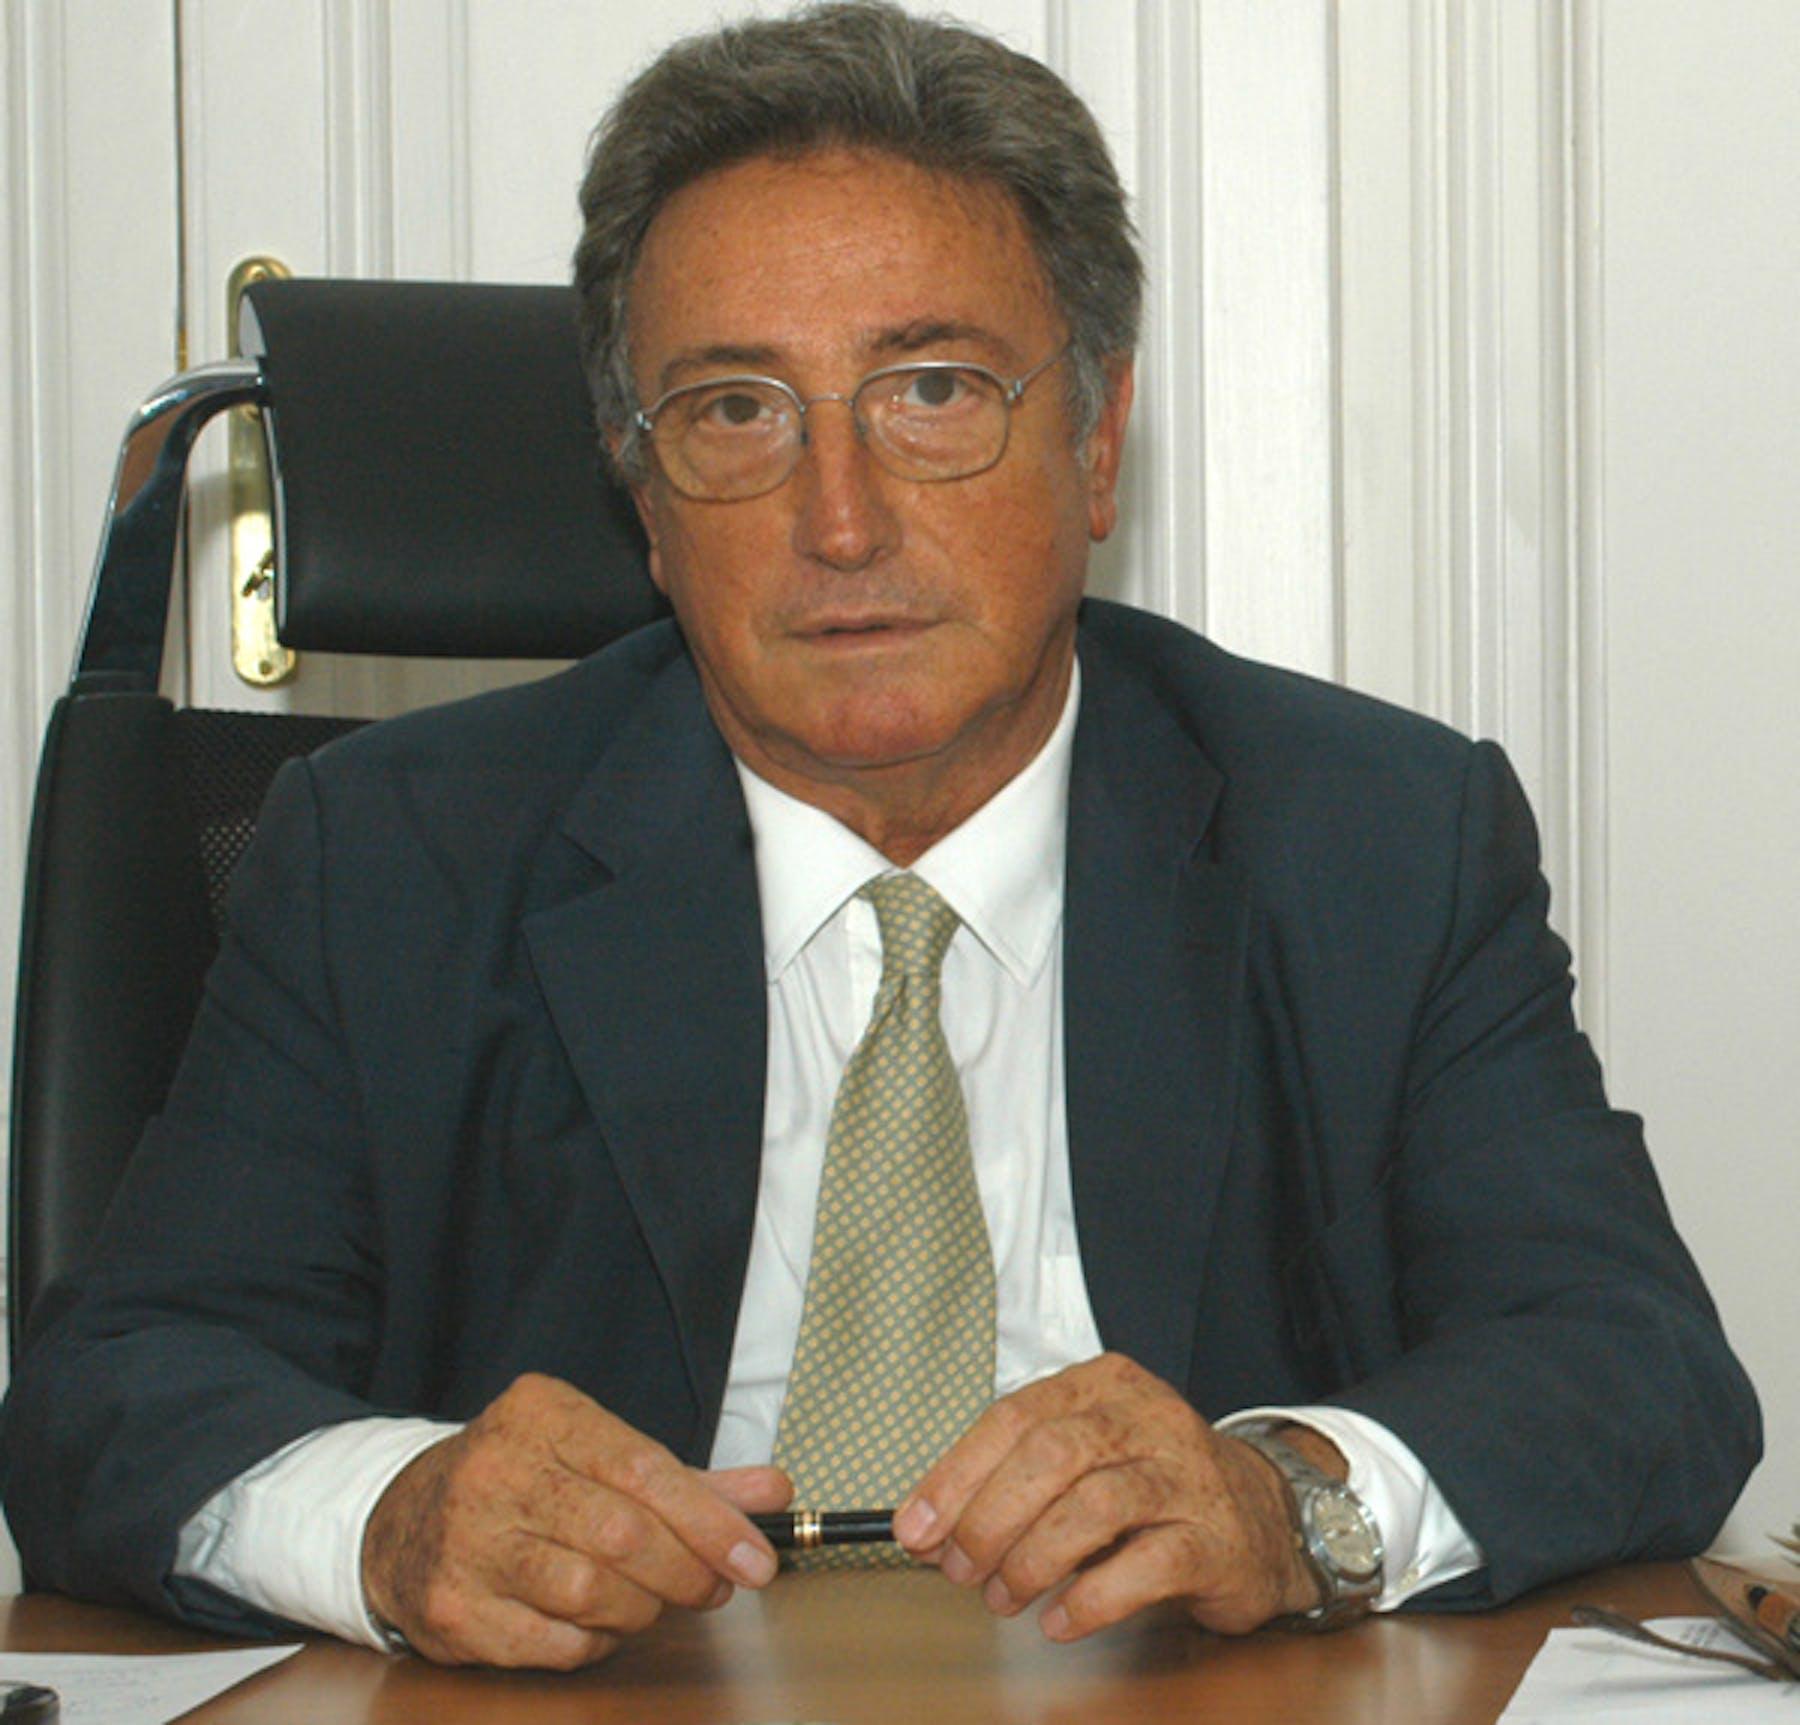 Antonio Sclavi - ©UNICEF Italia/A.Ruggeri